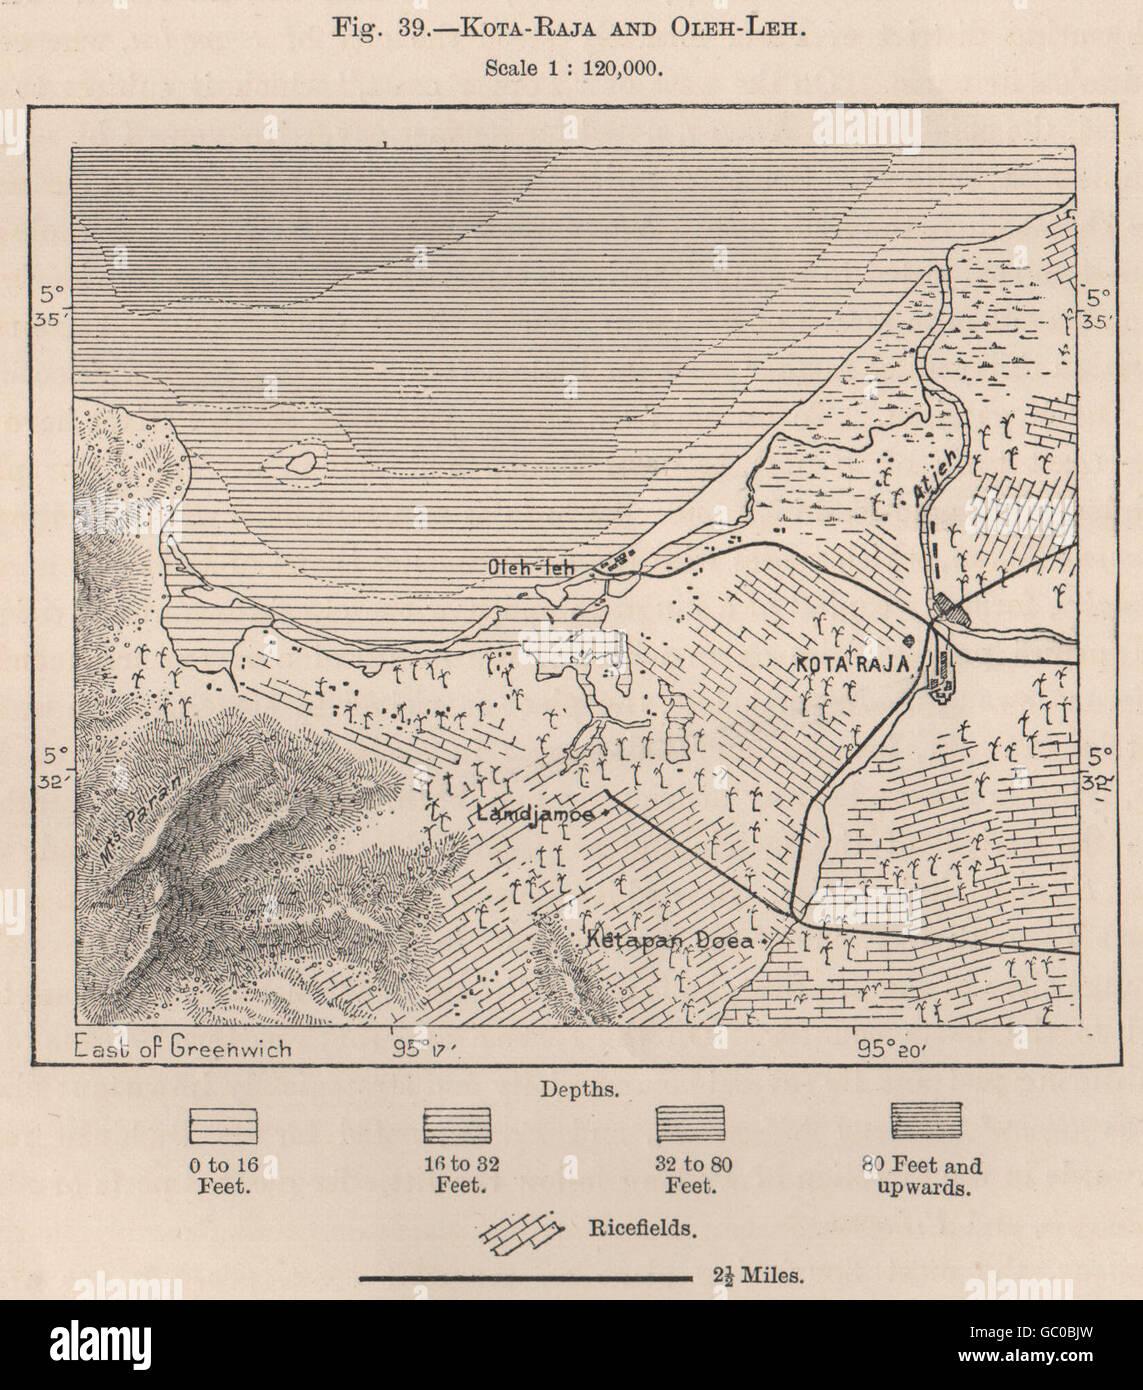 Kutaraja (Banda Aceh) & Oleelheue. Sumatra, Indonésie. East Indies, 1885 map Banque D'Images